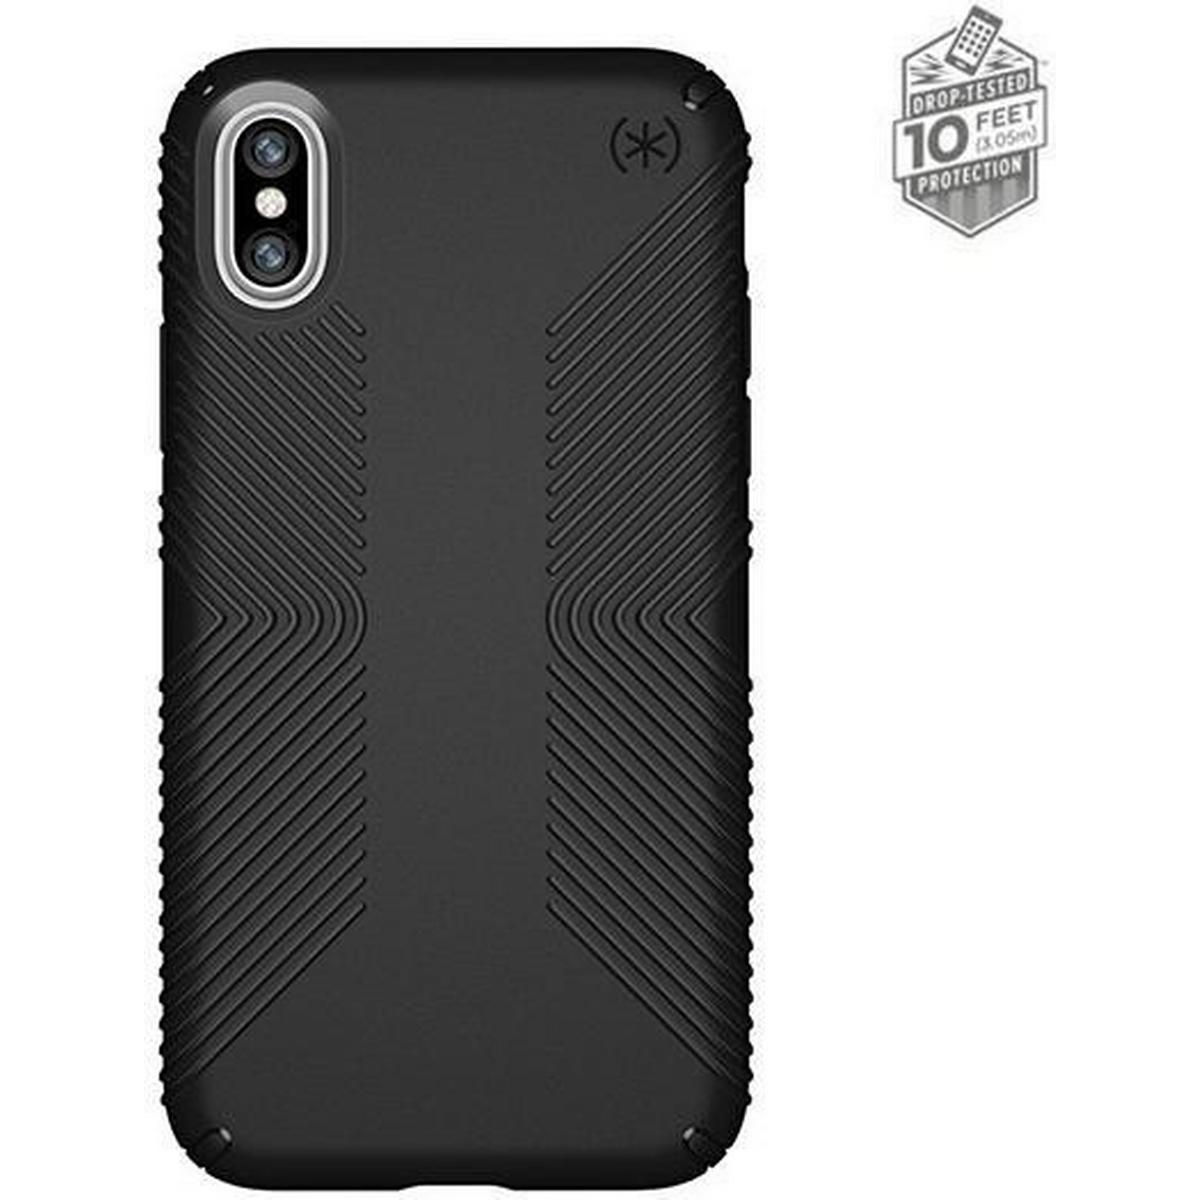 new product 3cc5d 1d02e Speck Mobiltelefon tilbehør - Sammenlign priser hos PriceRunner